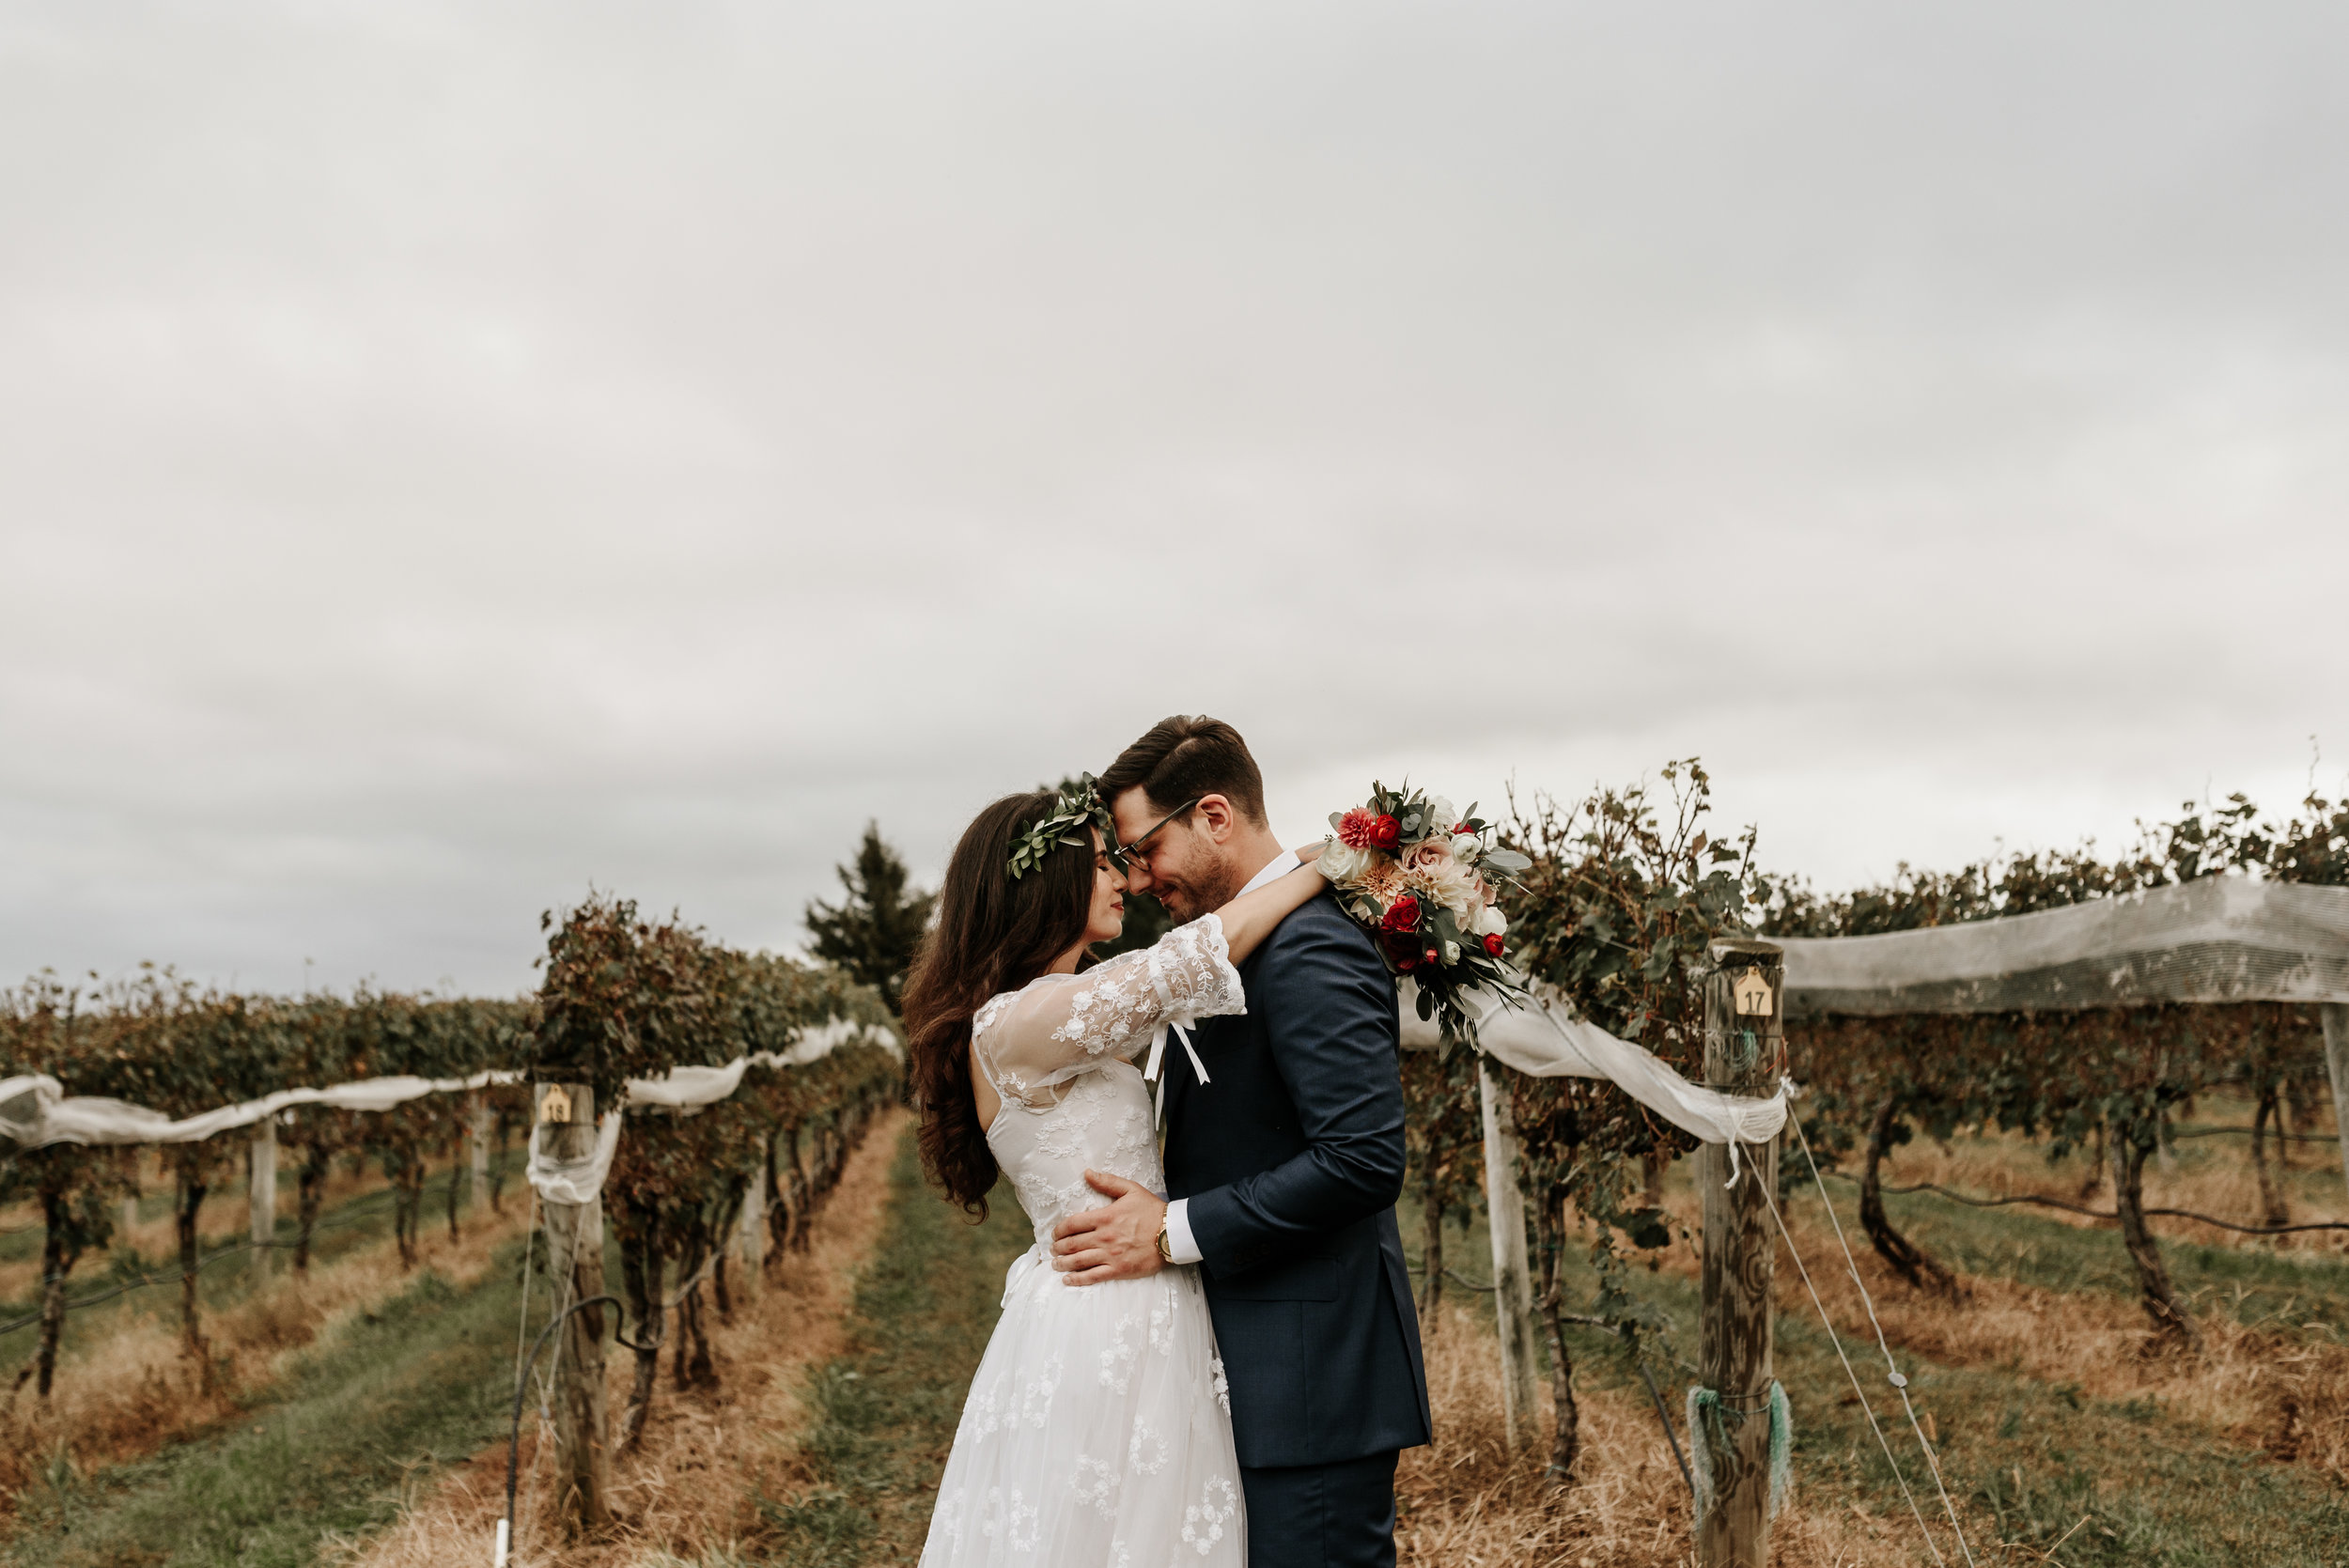 Veritas-Vineyards-and-Winery-Wedding-Photography-Afton-Virginia-Yasmin-Seth-Photography-by-V-9532.jpg